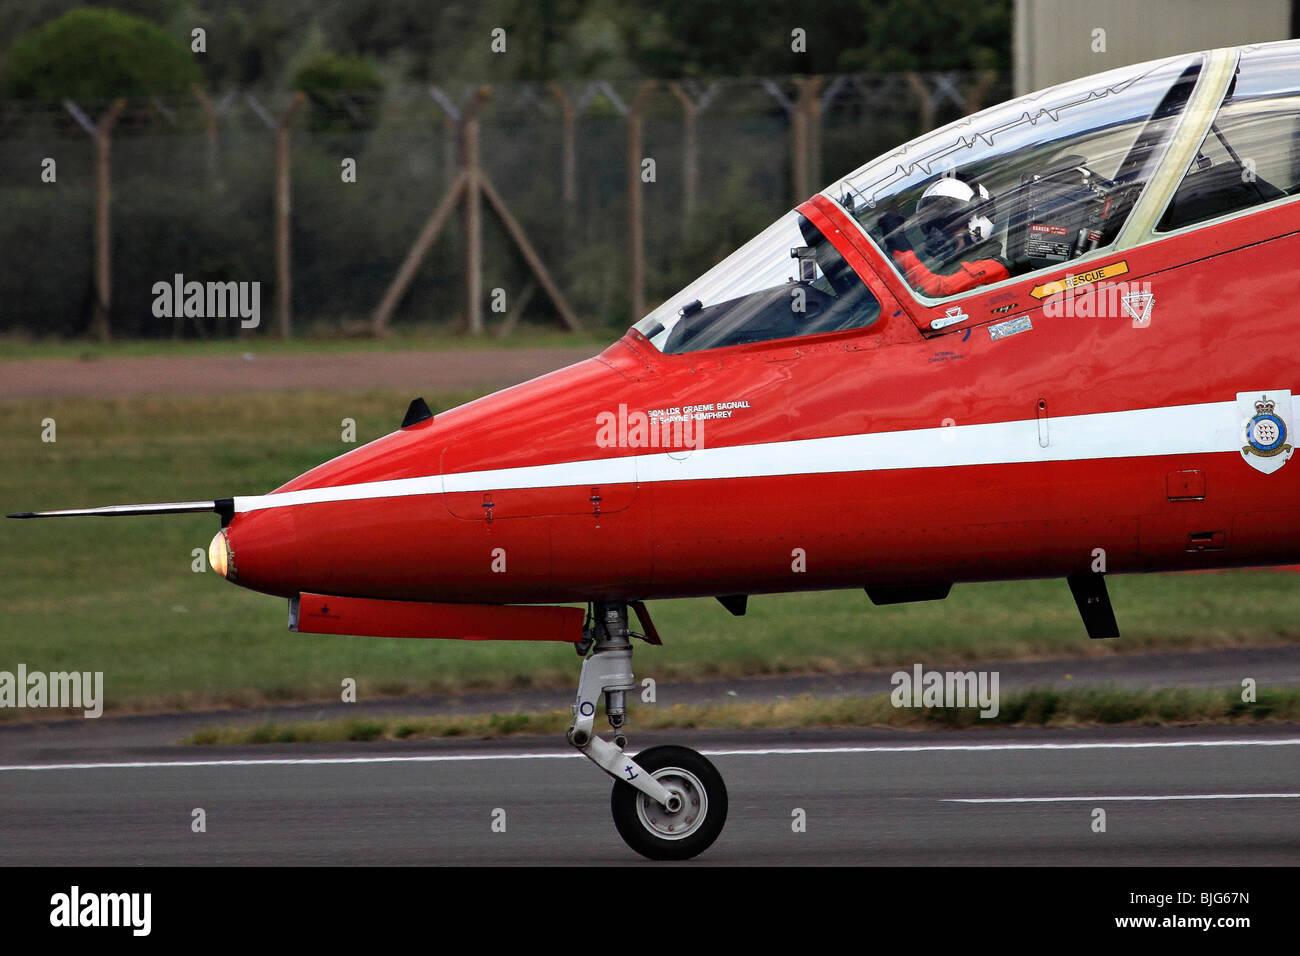 Royal Air Force Aerobatic Team Red Arrows at the Royal International Air Tattoo (RIAT) Air Show July 2009 - Stock Image